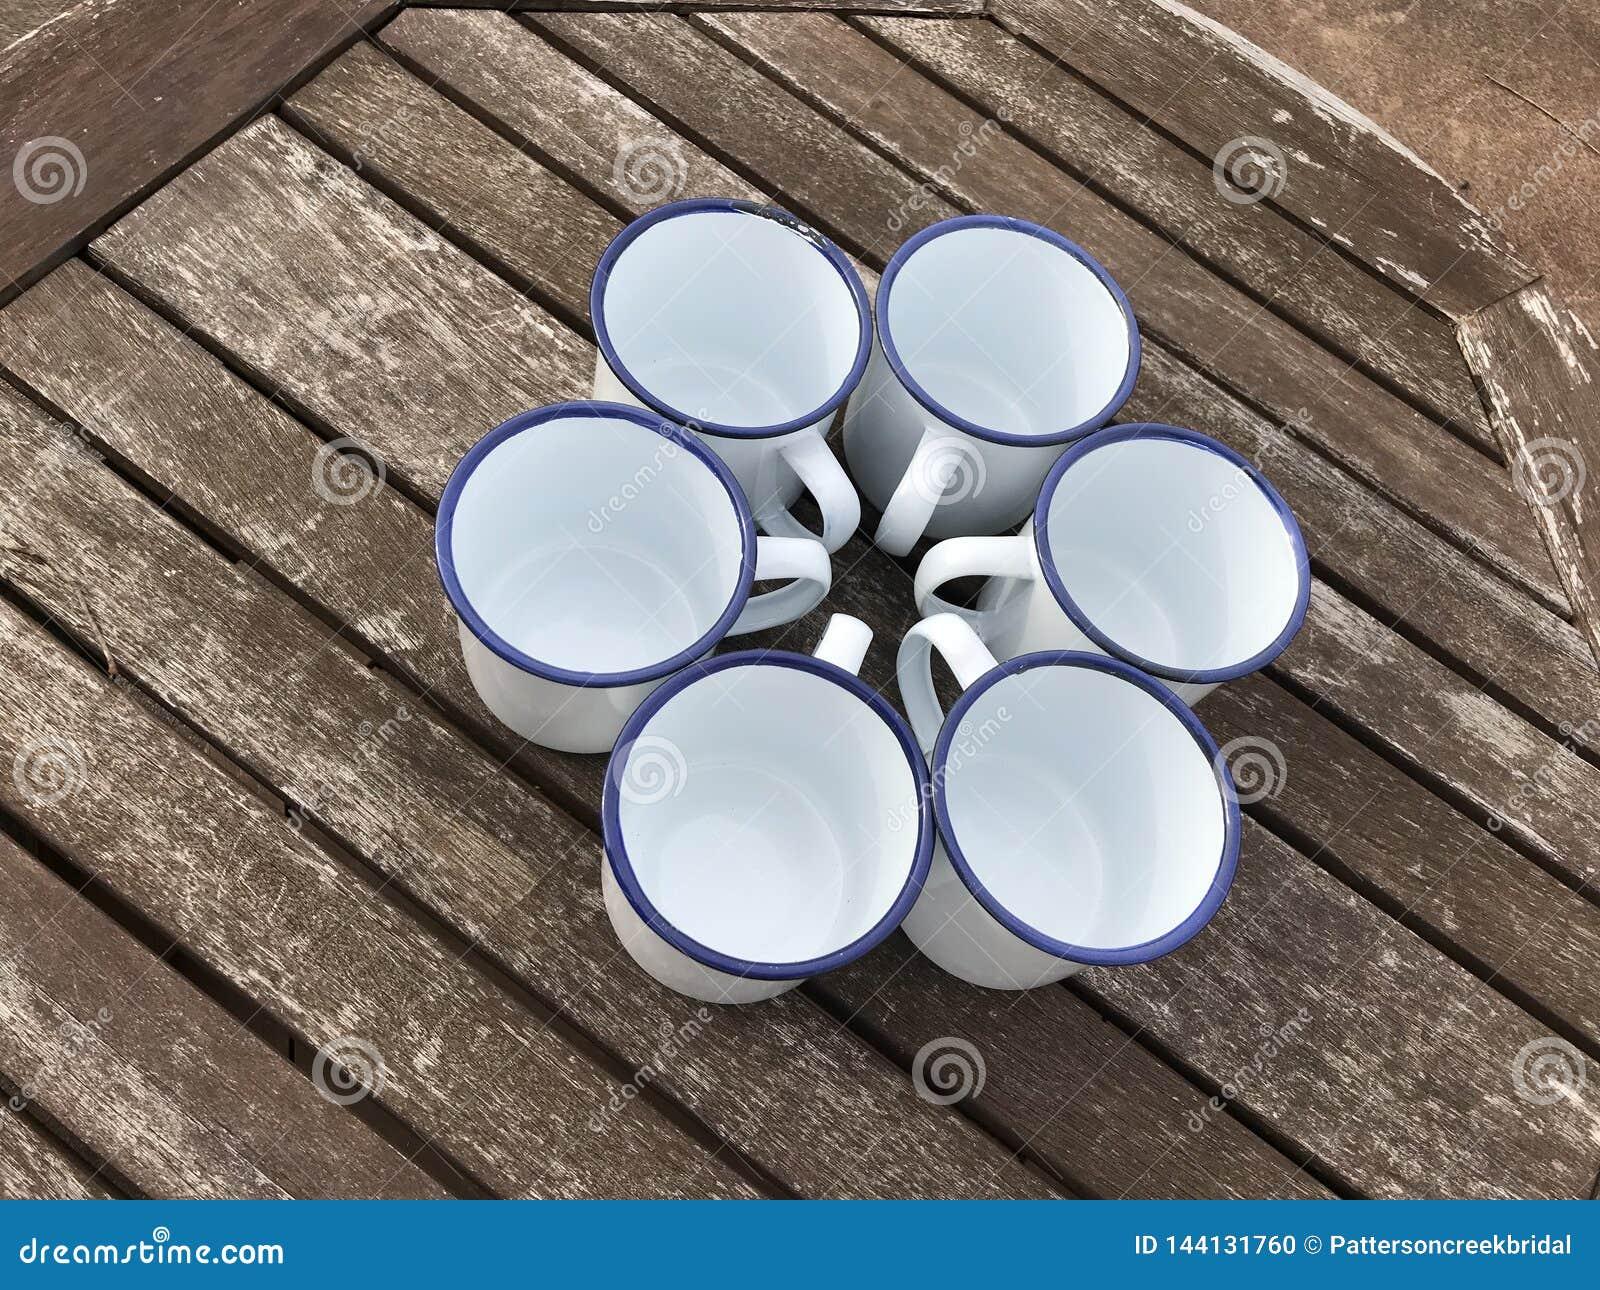 Enamel Coated Tin Cups Mugs Mock-up